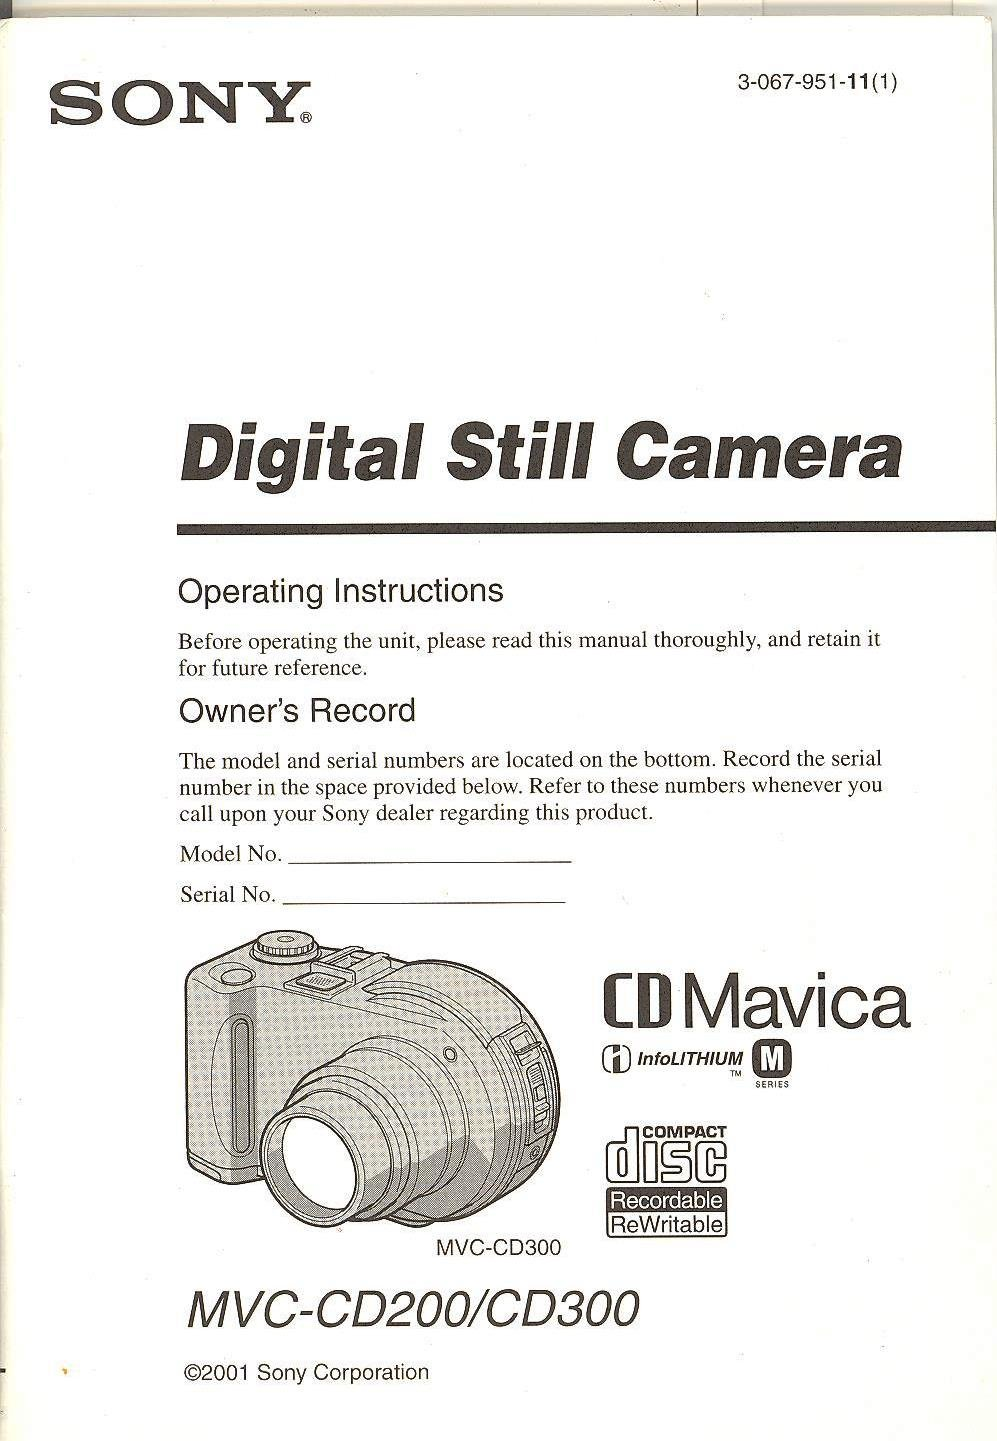 MVC CD200 DRIVERS FOR WINDOWS 8